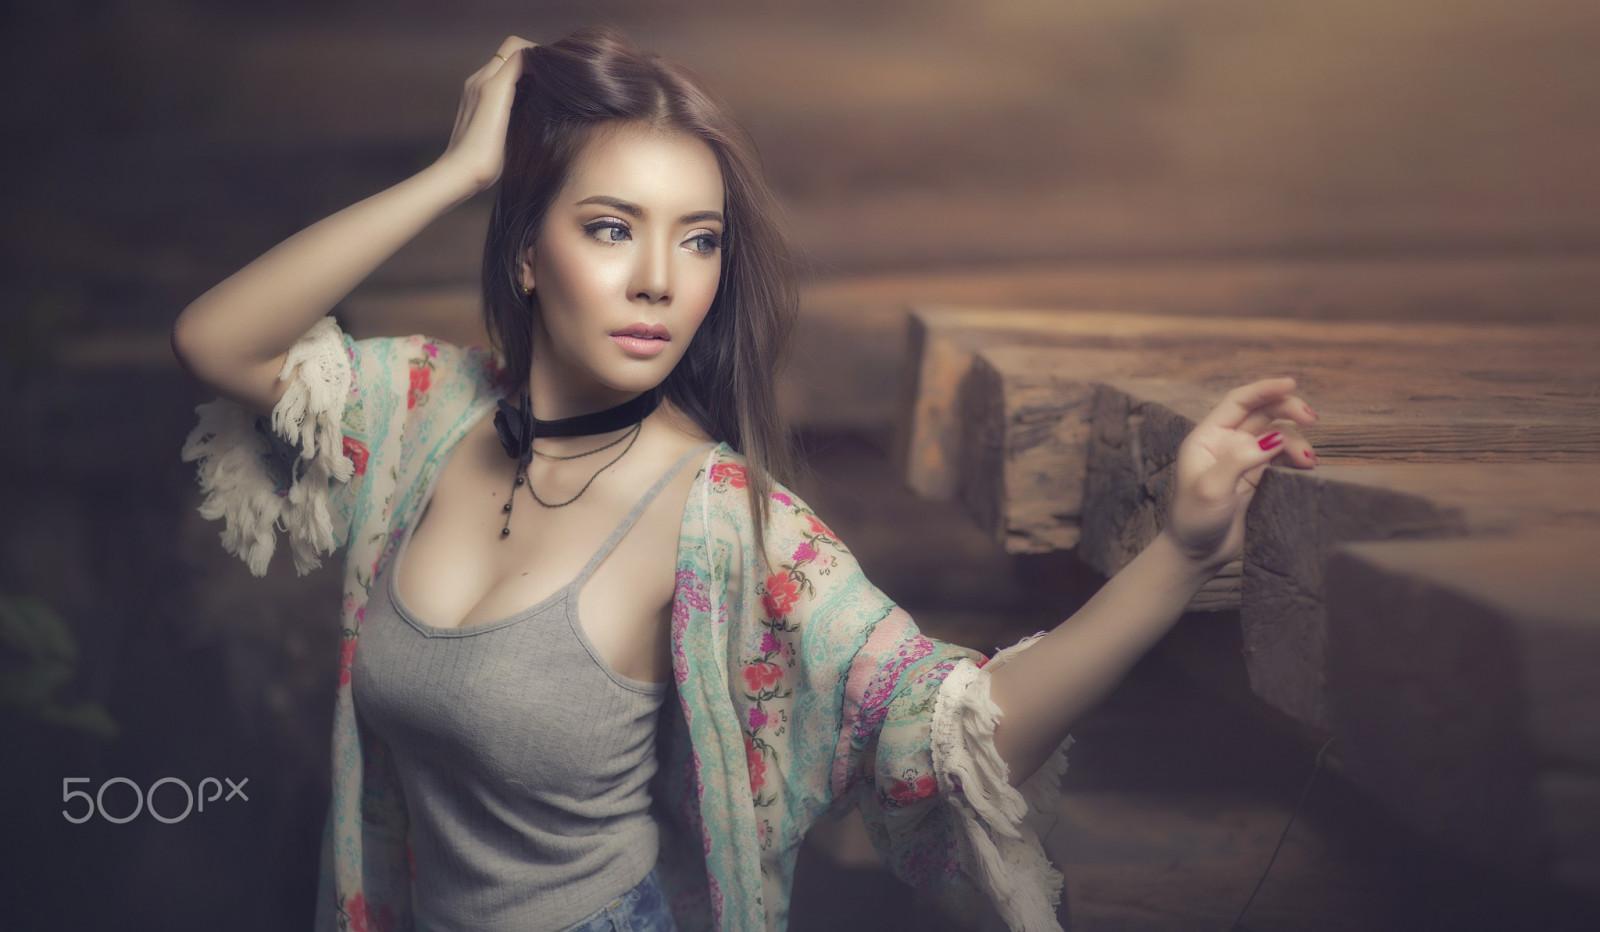 Asiatisk datingside store bryster bilder